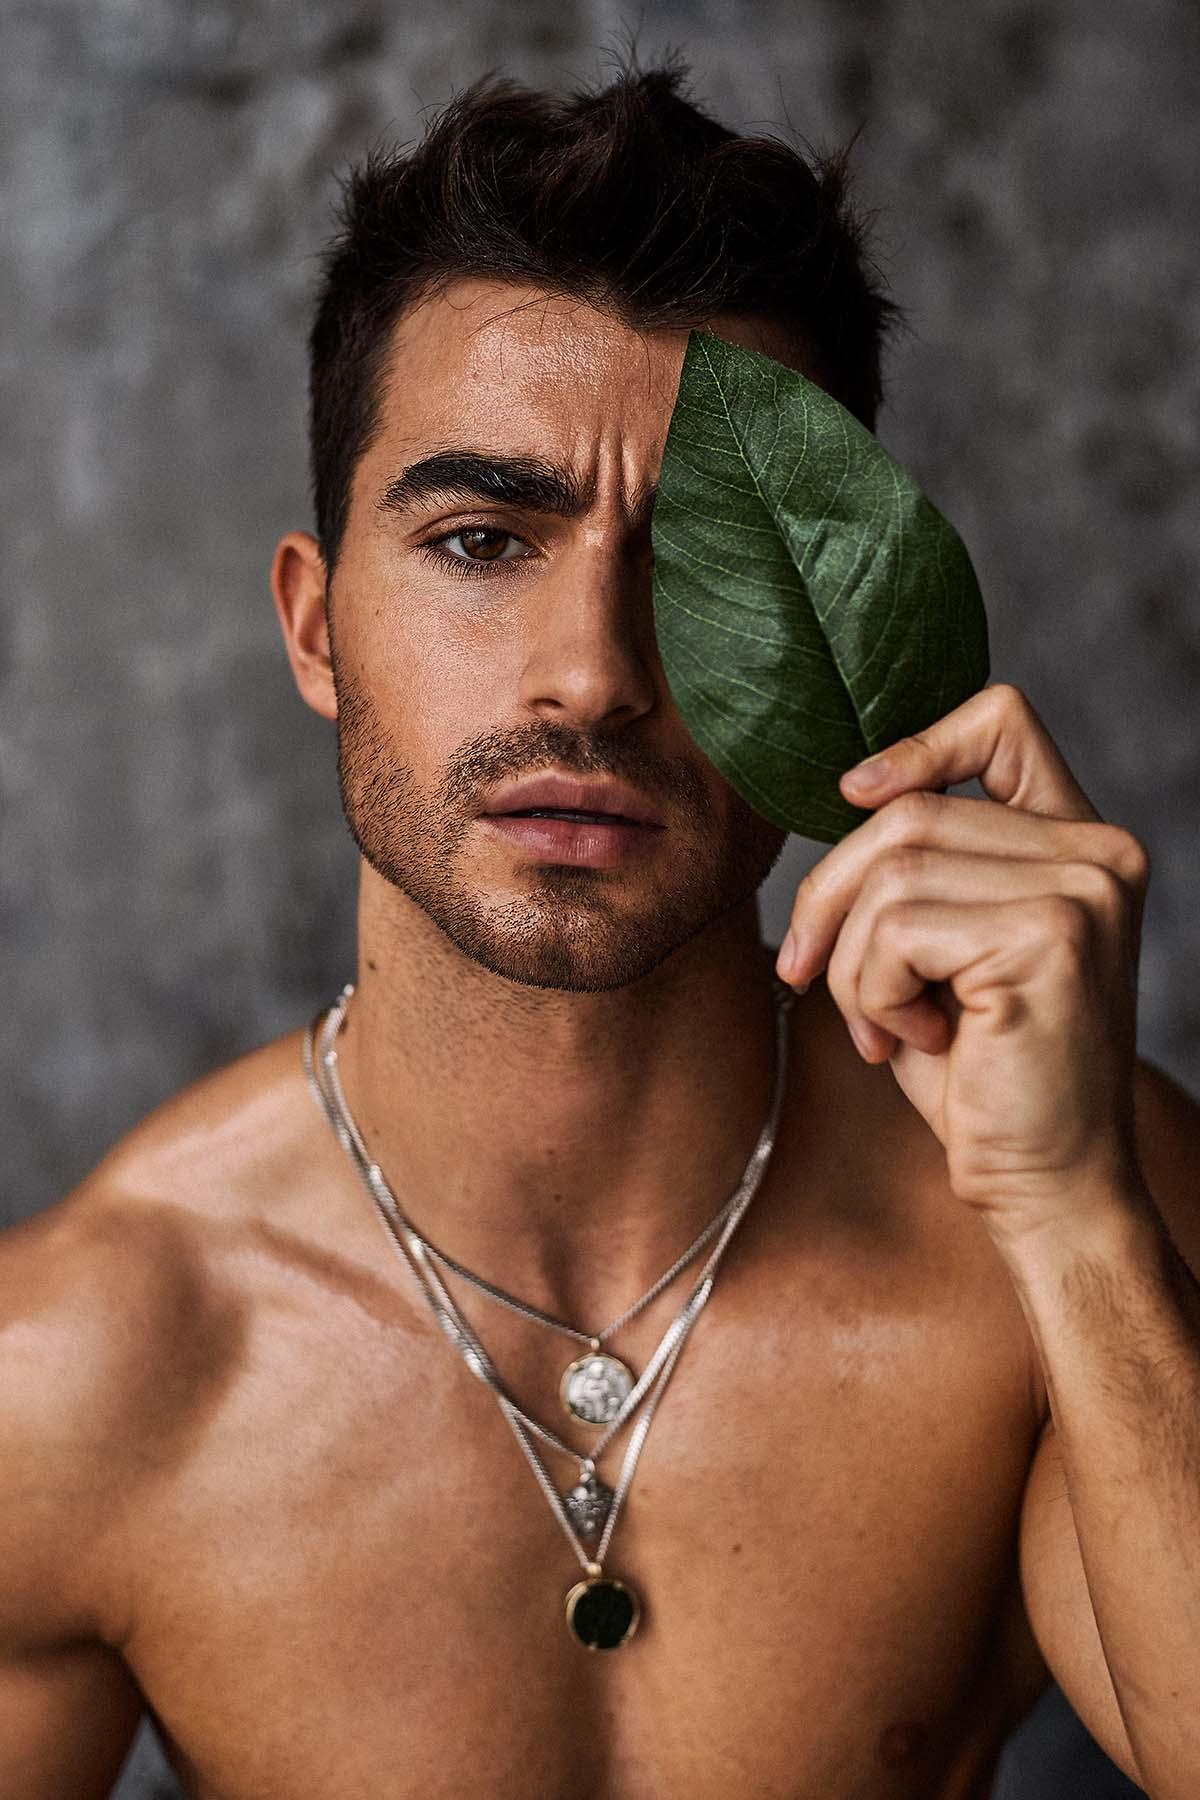 Valter Silva by Norbert Zsolyomi for Brazilian Male Model